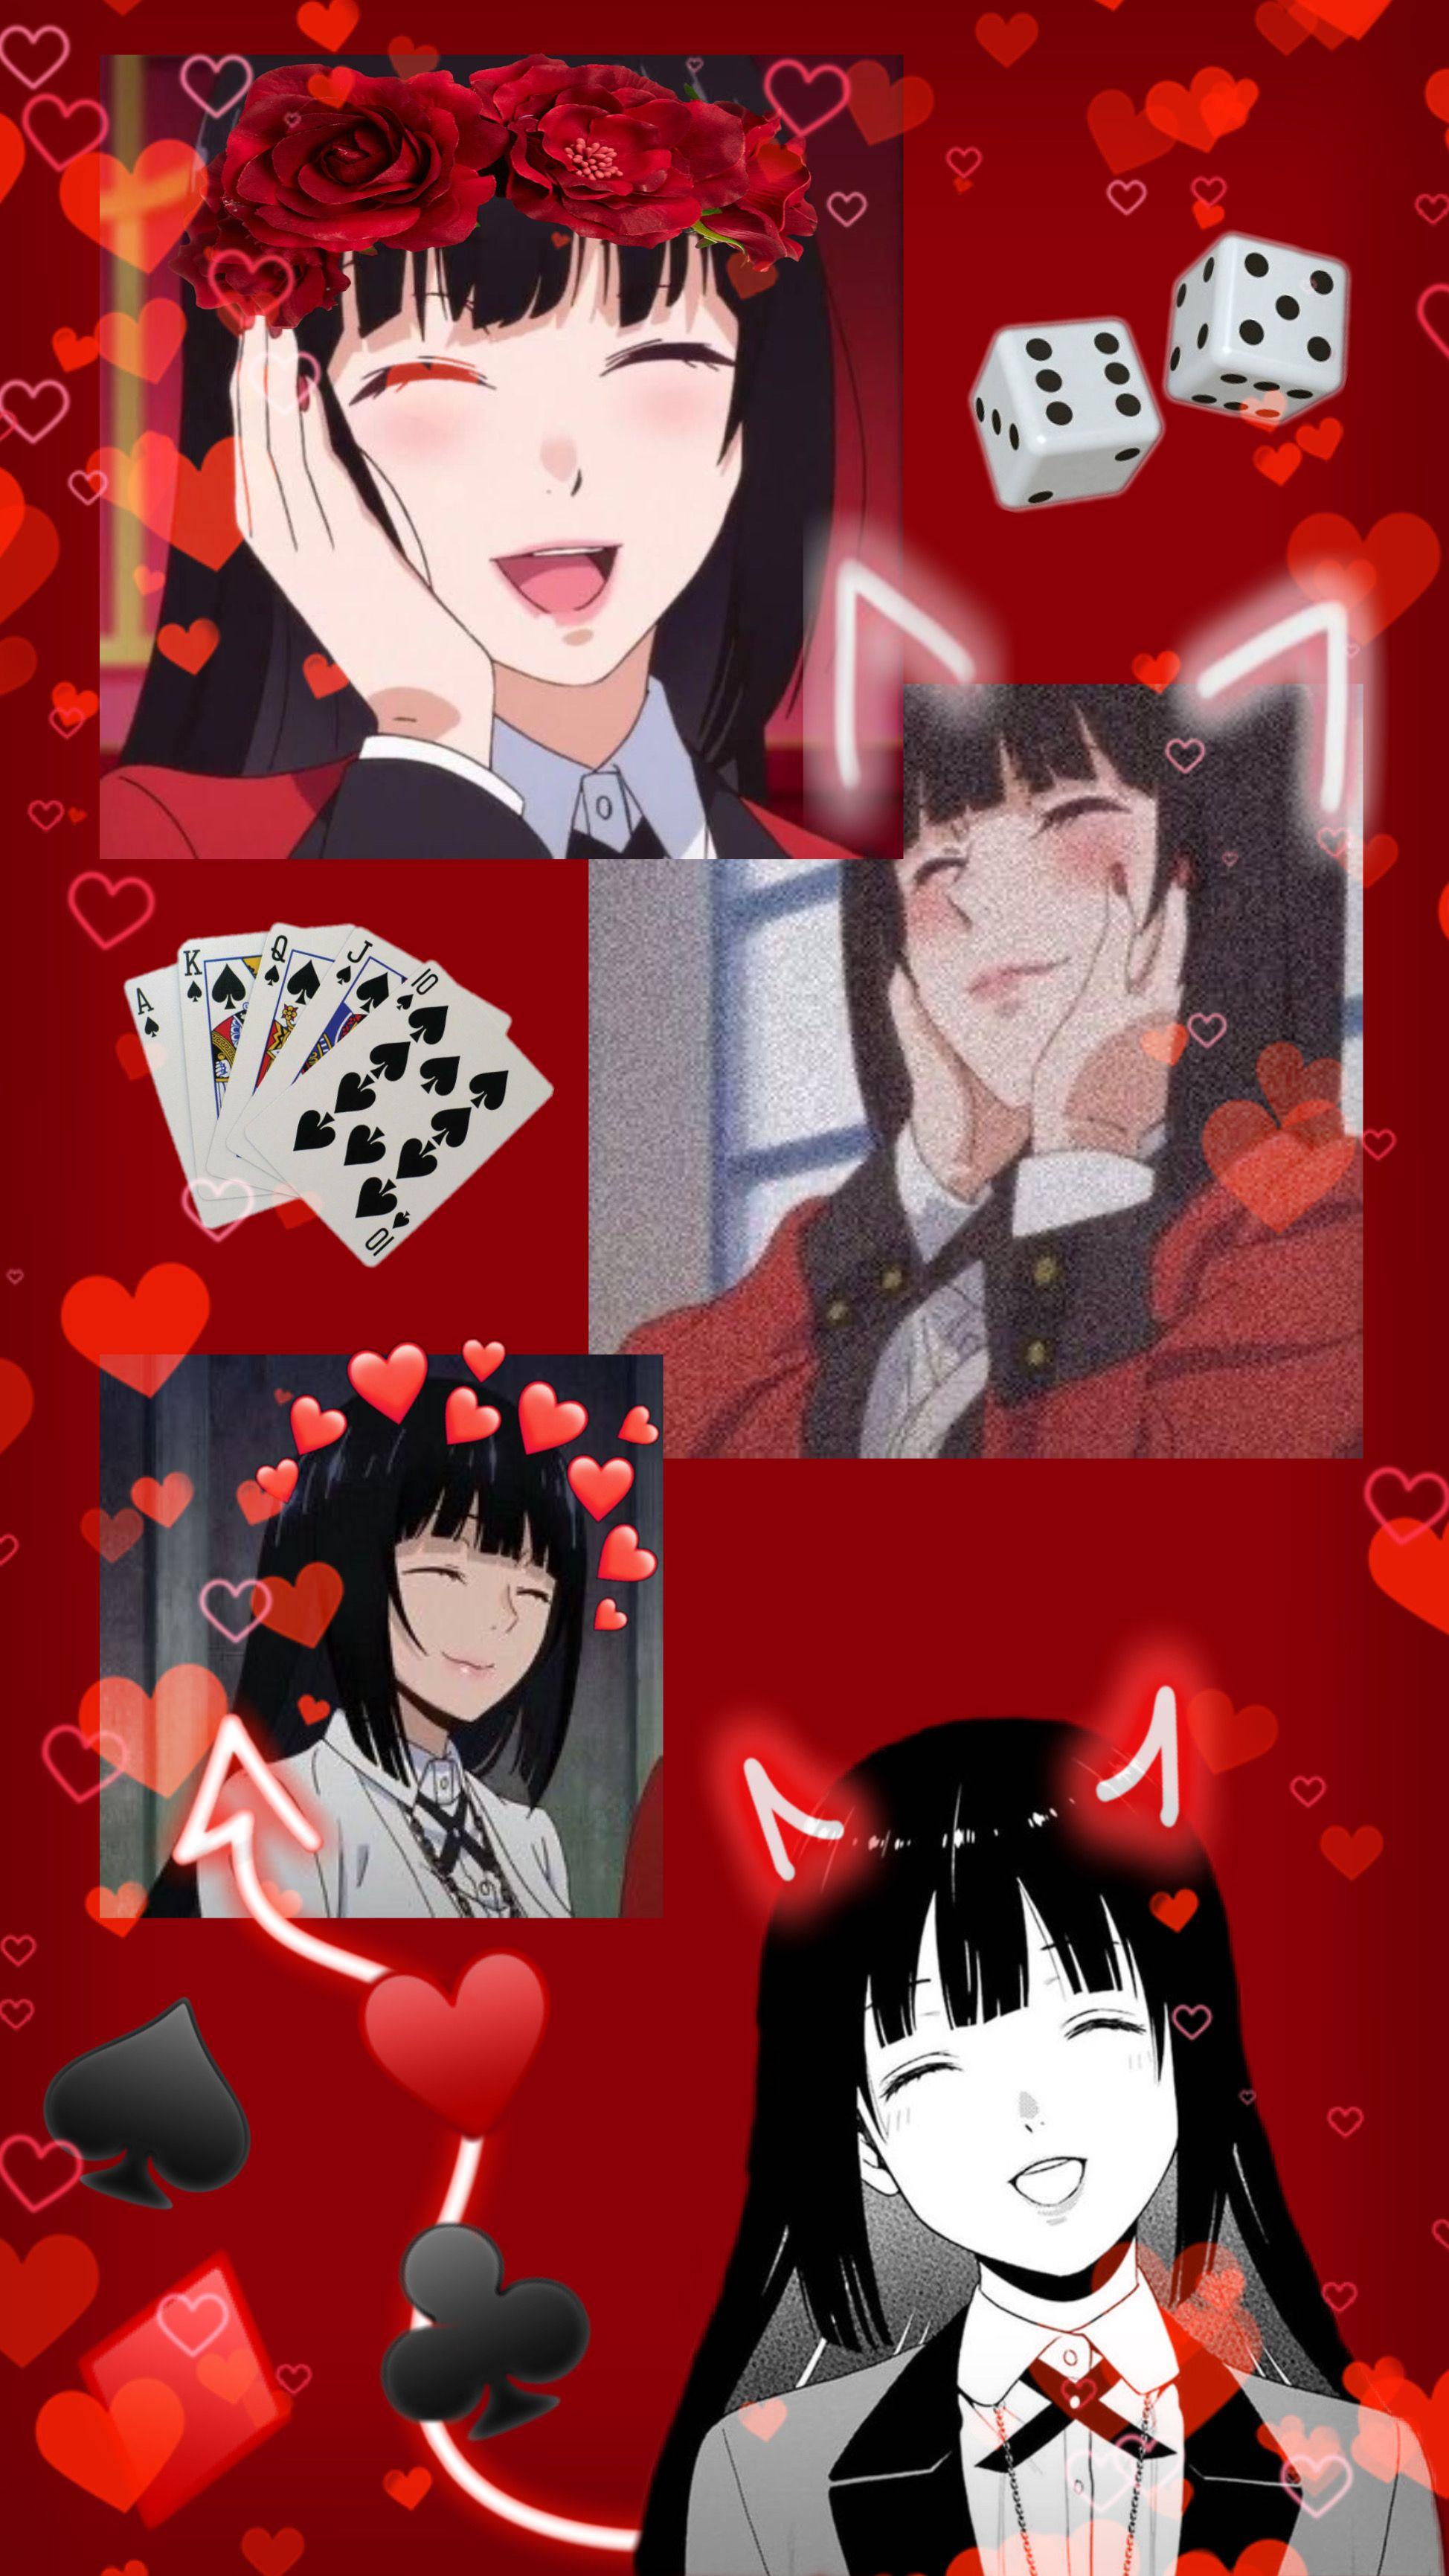 Yumeko Jabami Wallpaper Cute Anime Wallpaper Anime Wallpaper Iphone Yandere Anime